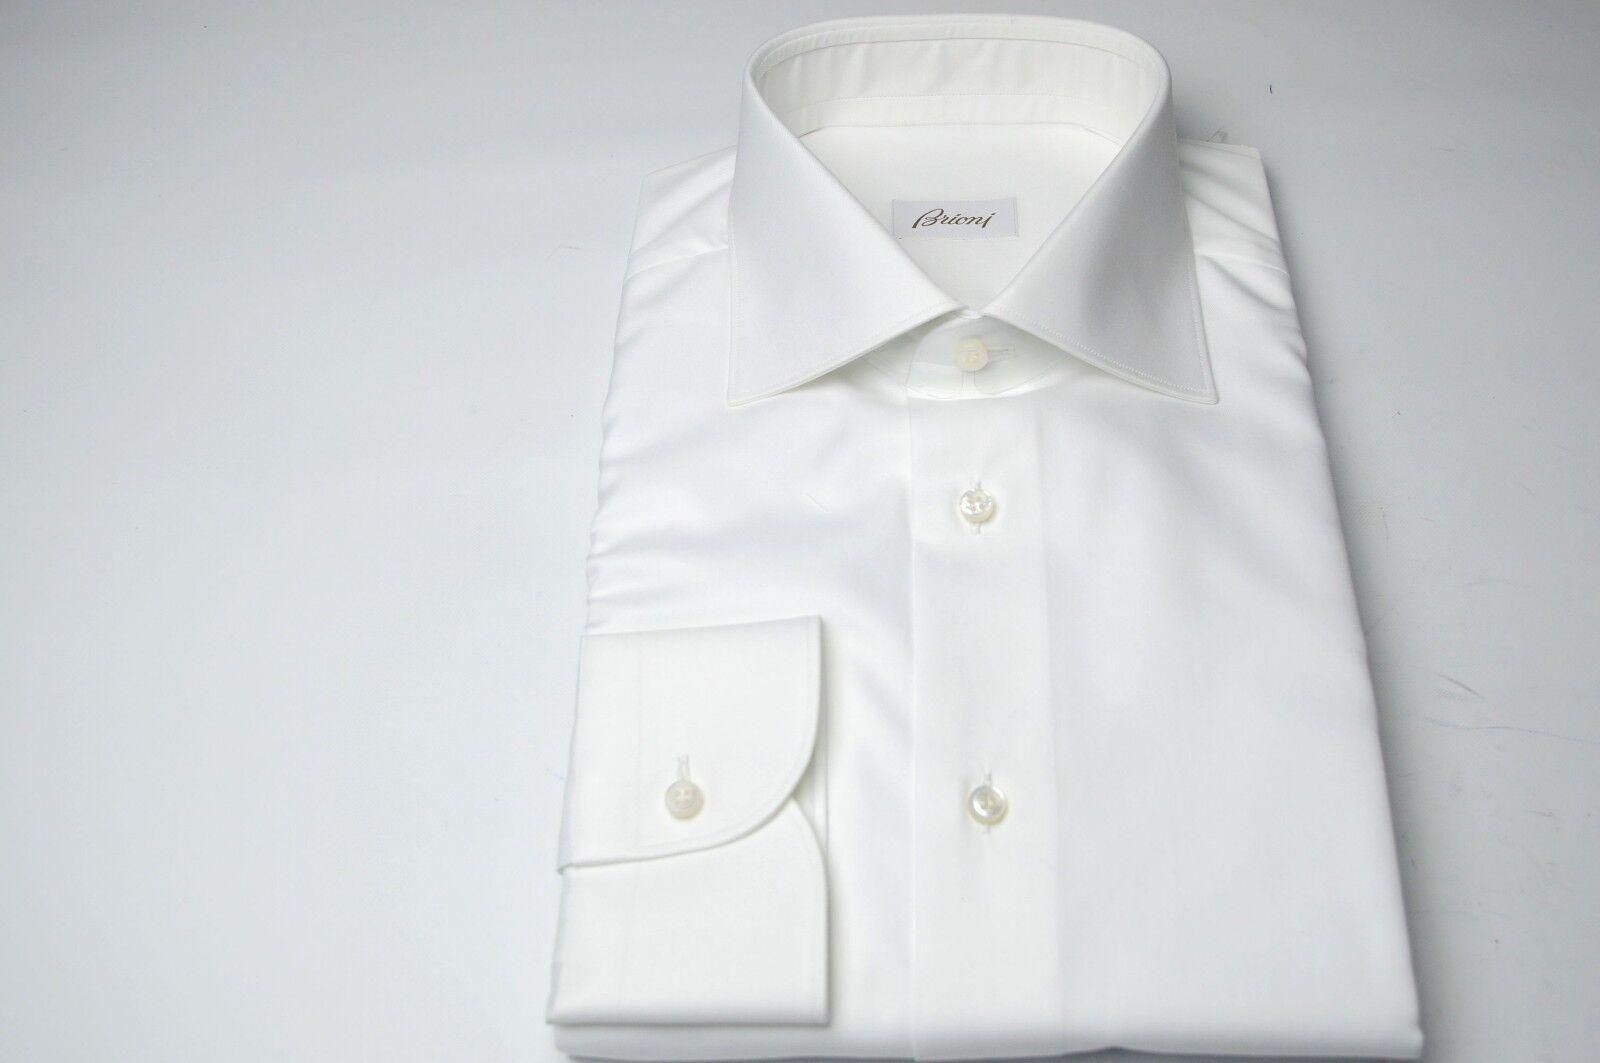 NEW   590,00 BRIONI Dress SHIRT 100% Cotton Size 15.5 Us 39 Eu (Cod MA61)